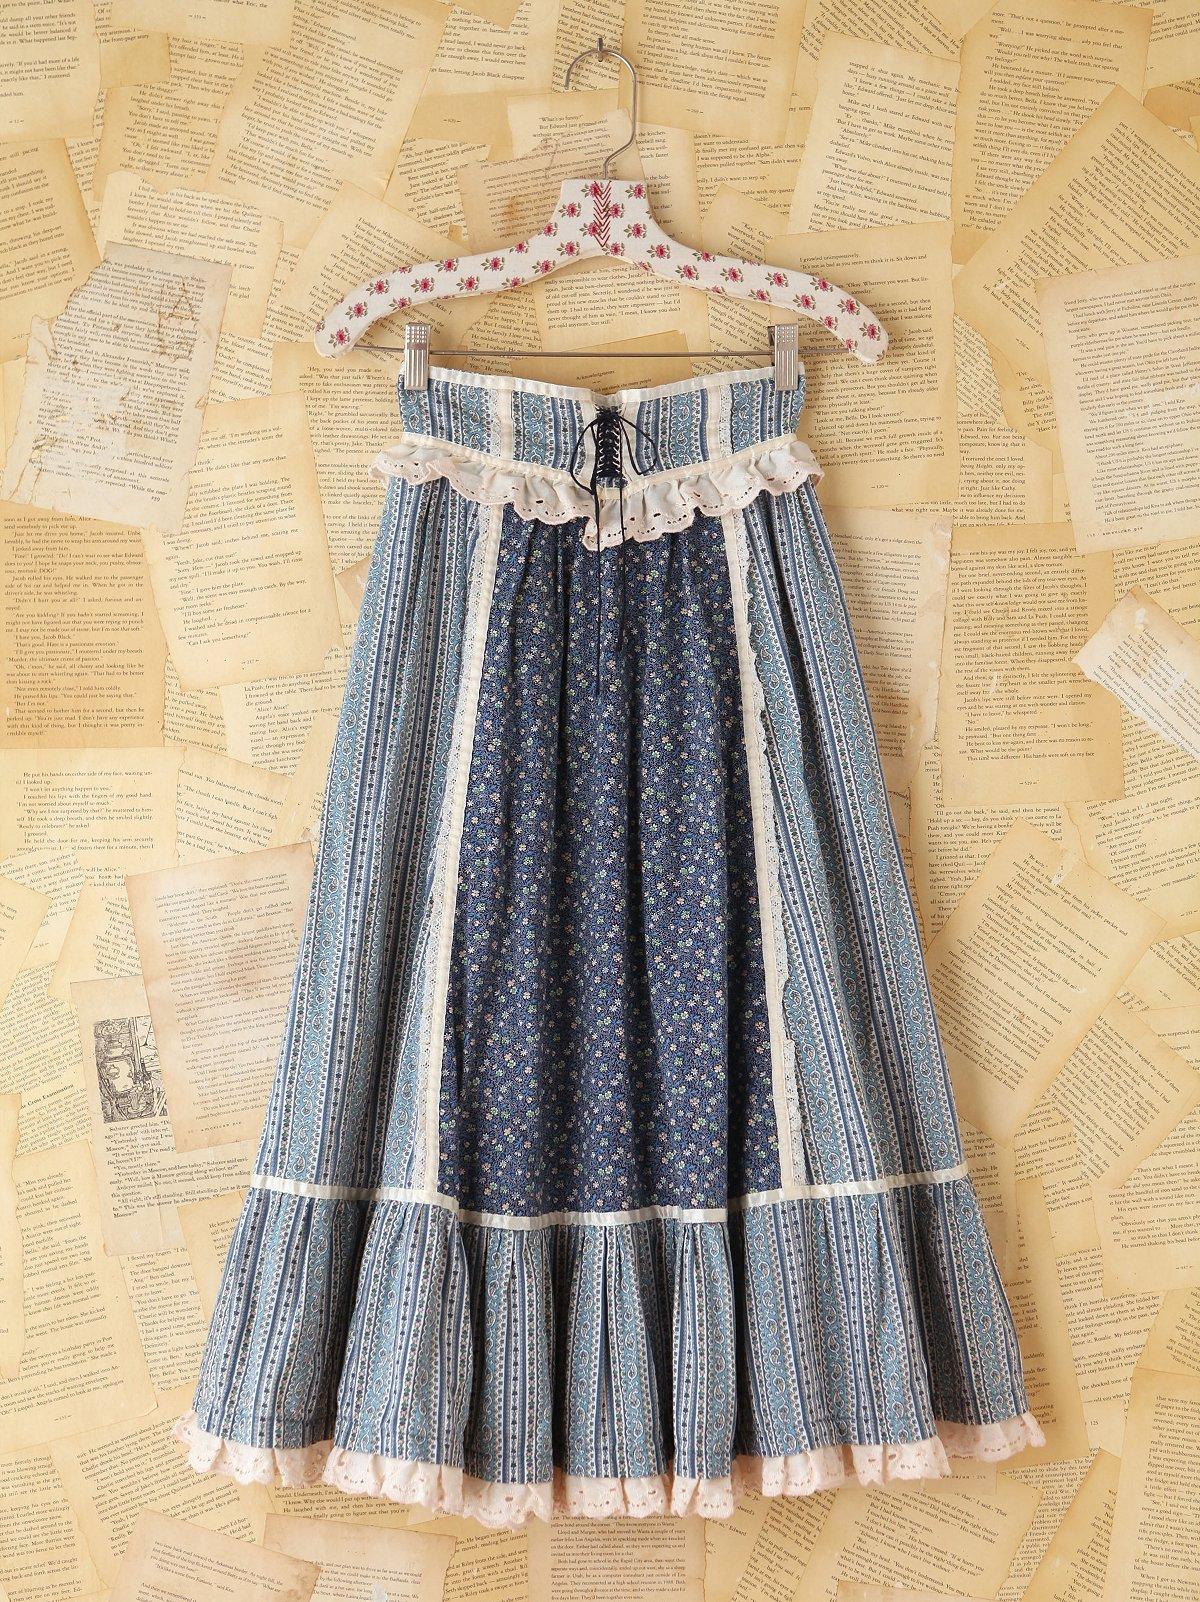 Vintage Blue Floral Printed Skirt